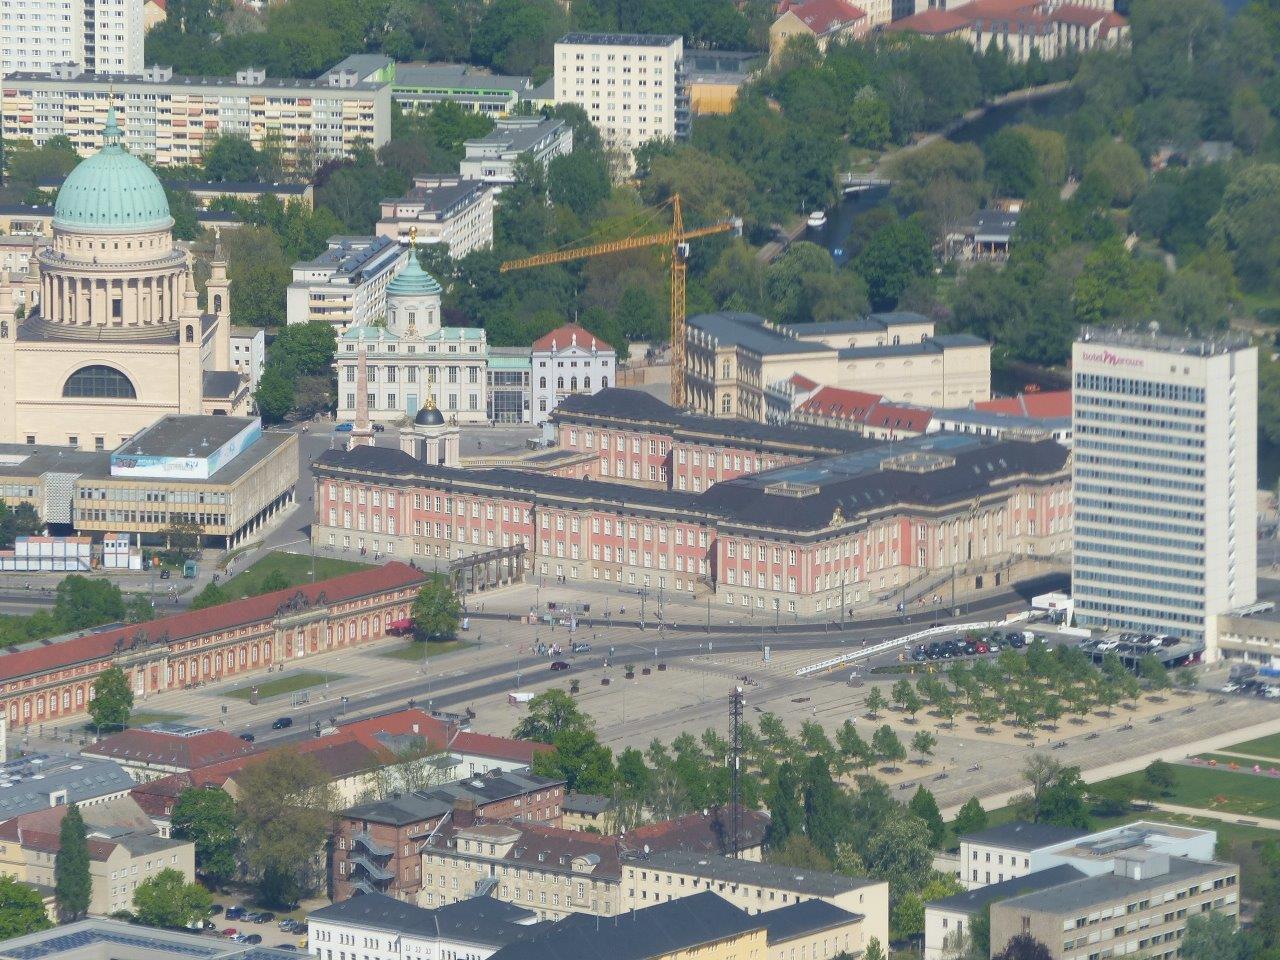 Luftbild Potsdamer Stadtmitte, Foto: D.Weirauch